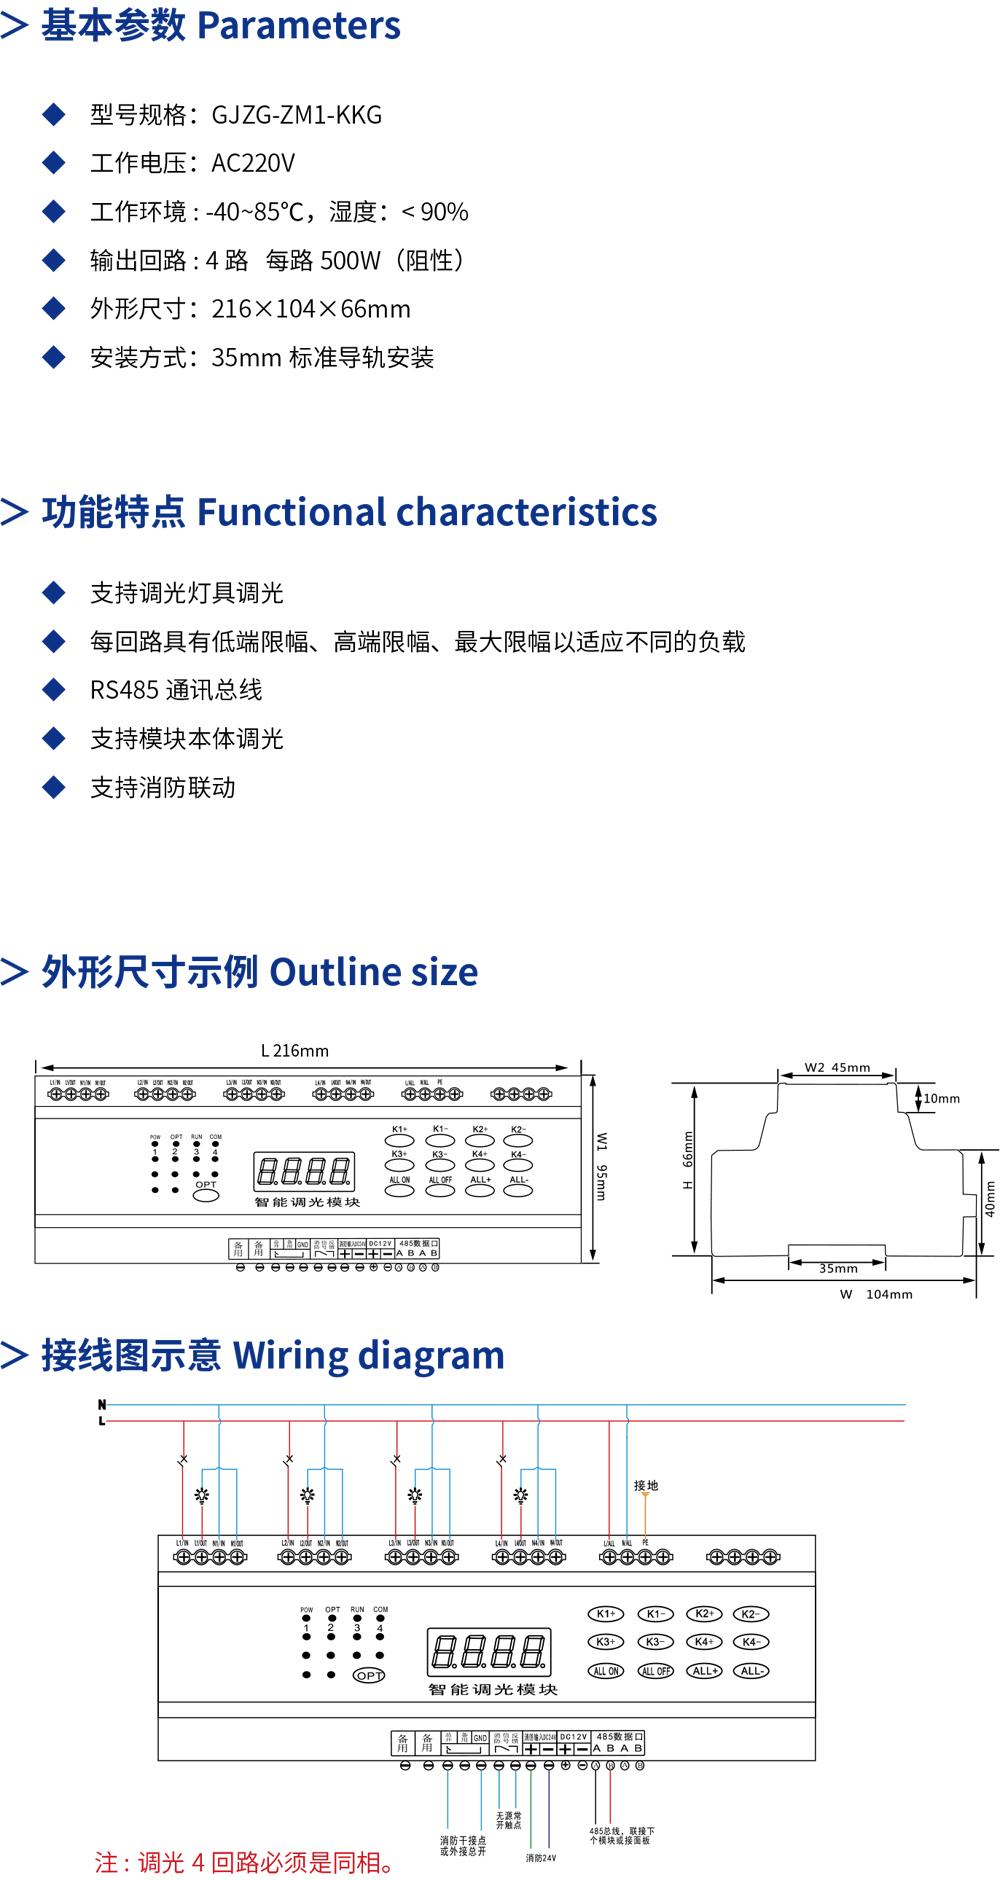 GJZG-ZM1-KKG-可控硅智能調光模塊詳情.jpg